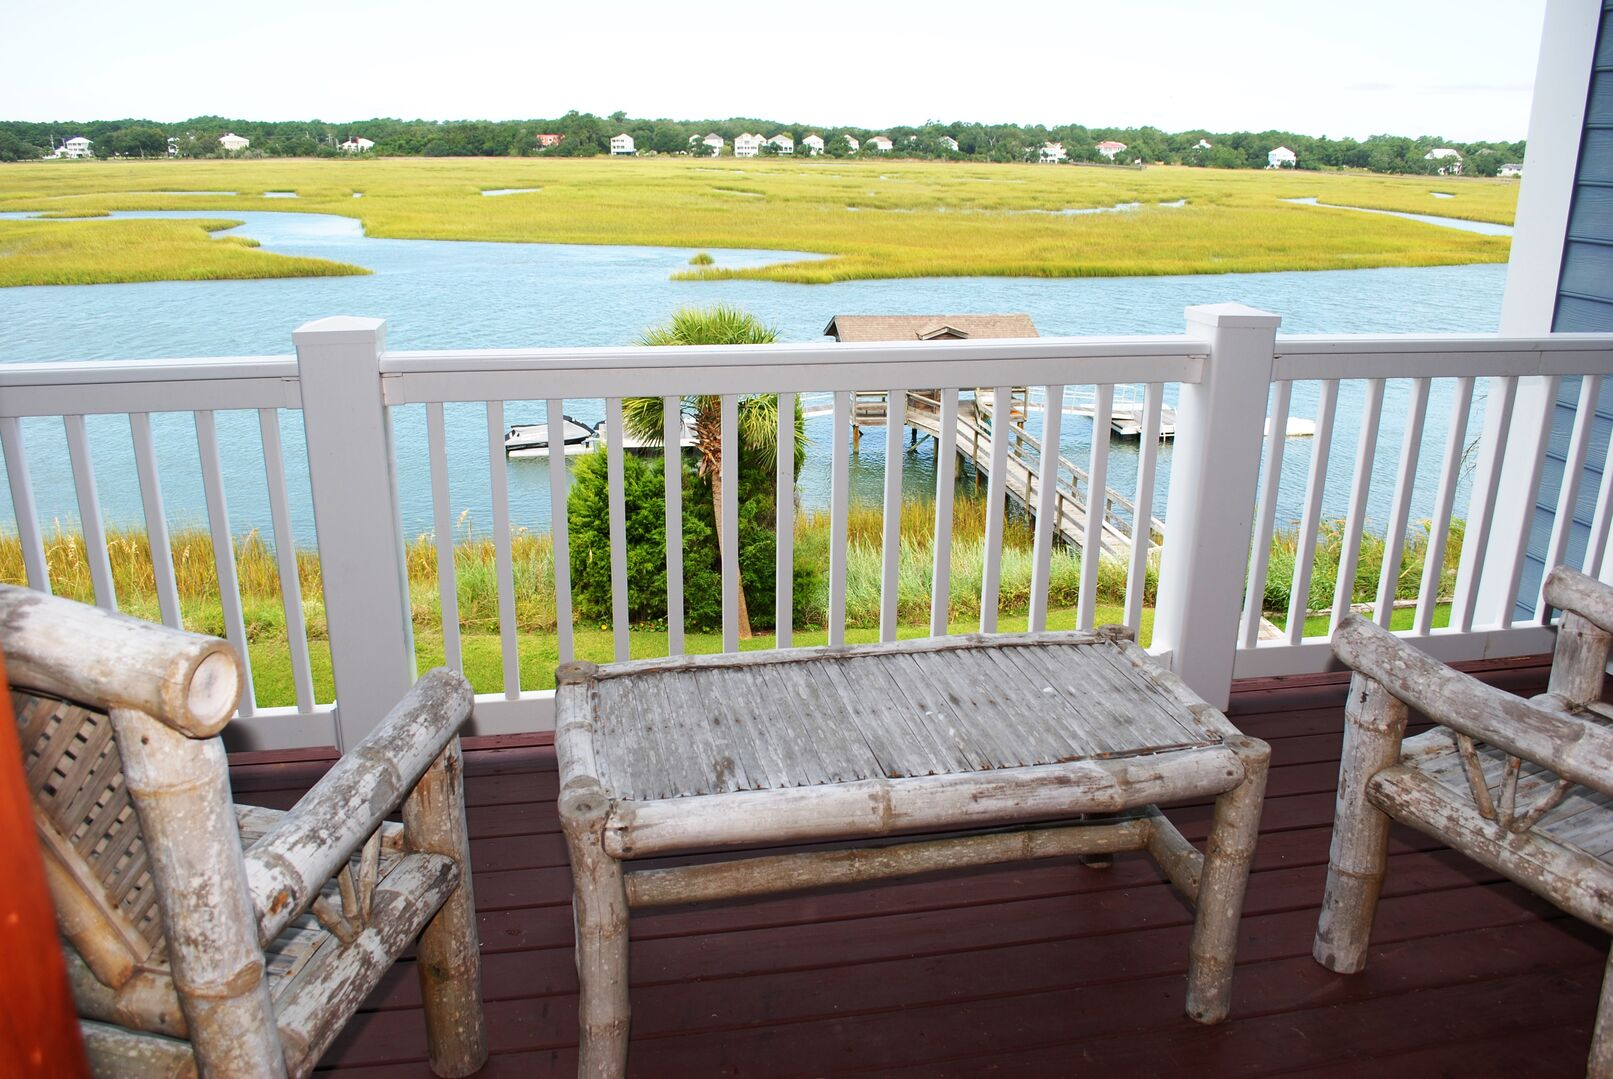 Balcony with Creek View - Second Floor